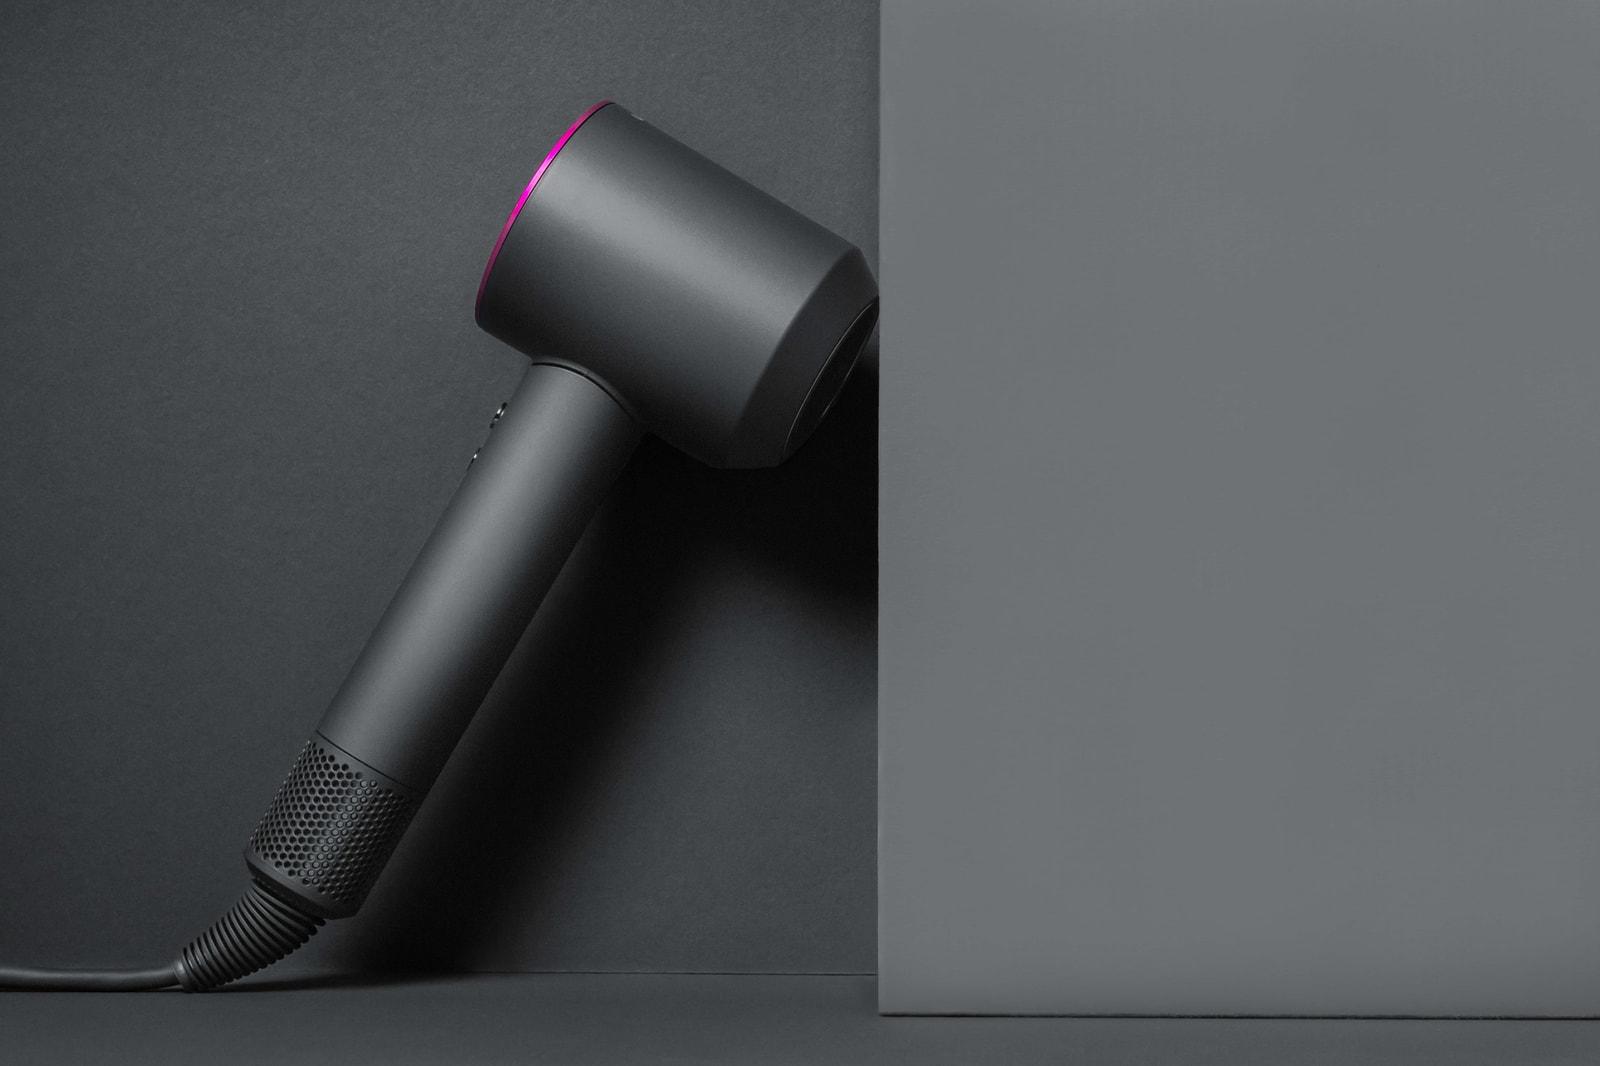 最貼心的情人節禮物 — Dyson Supersonic™ 風筒